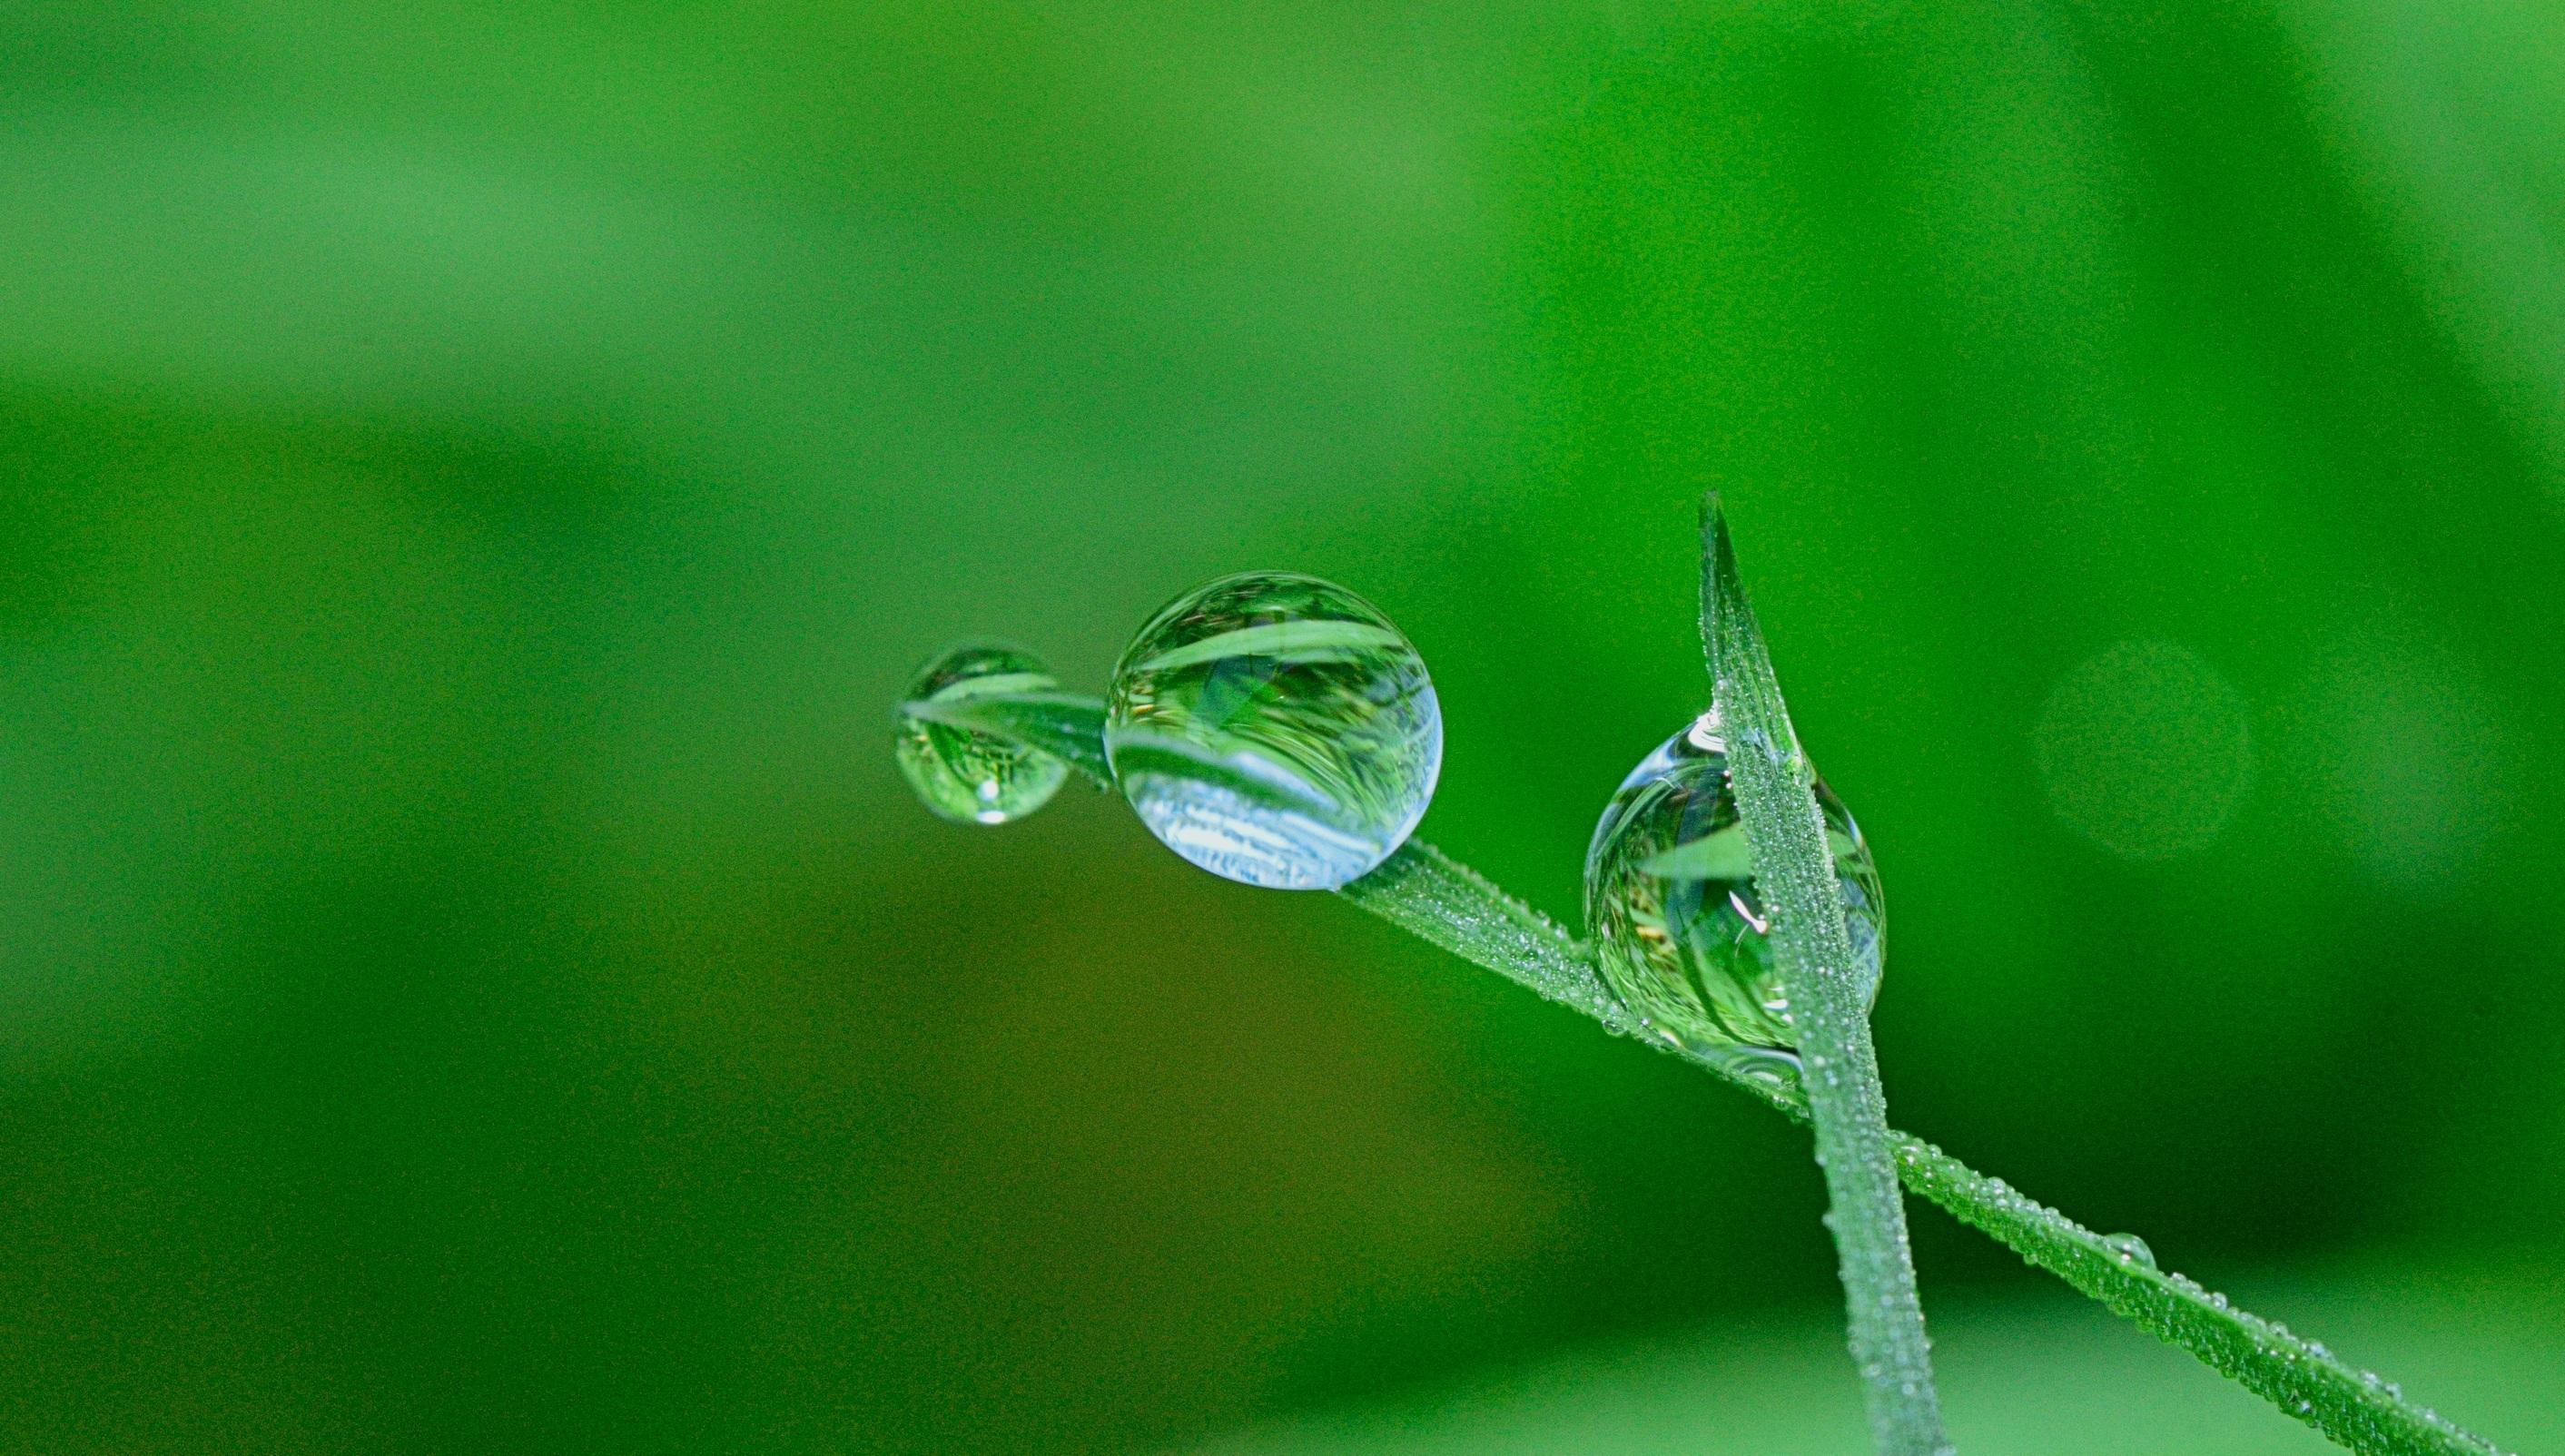 Free images nature grass branch drop dew lawn rain for Immagini natura gratis